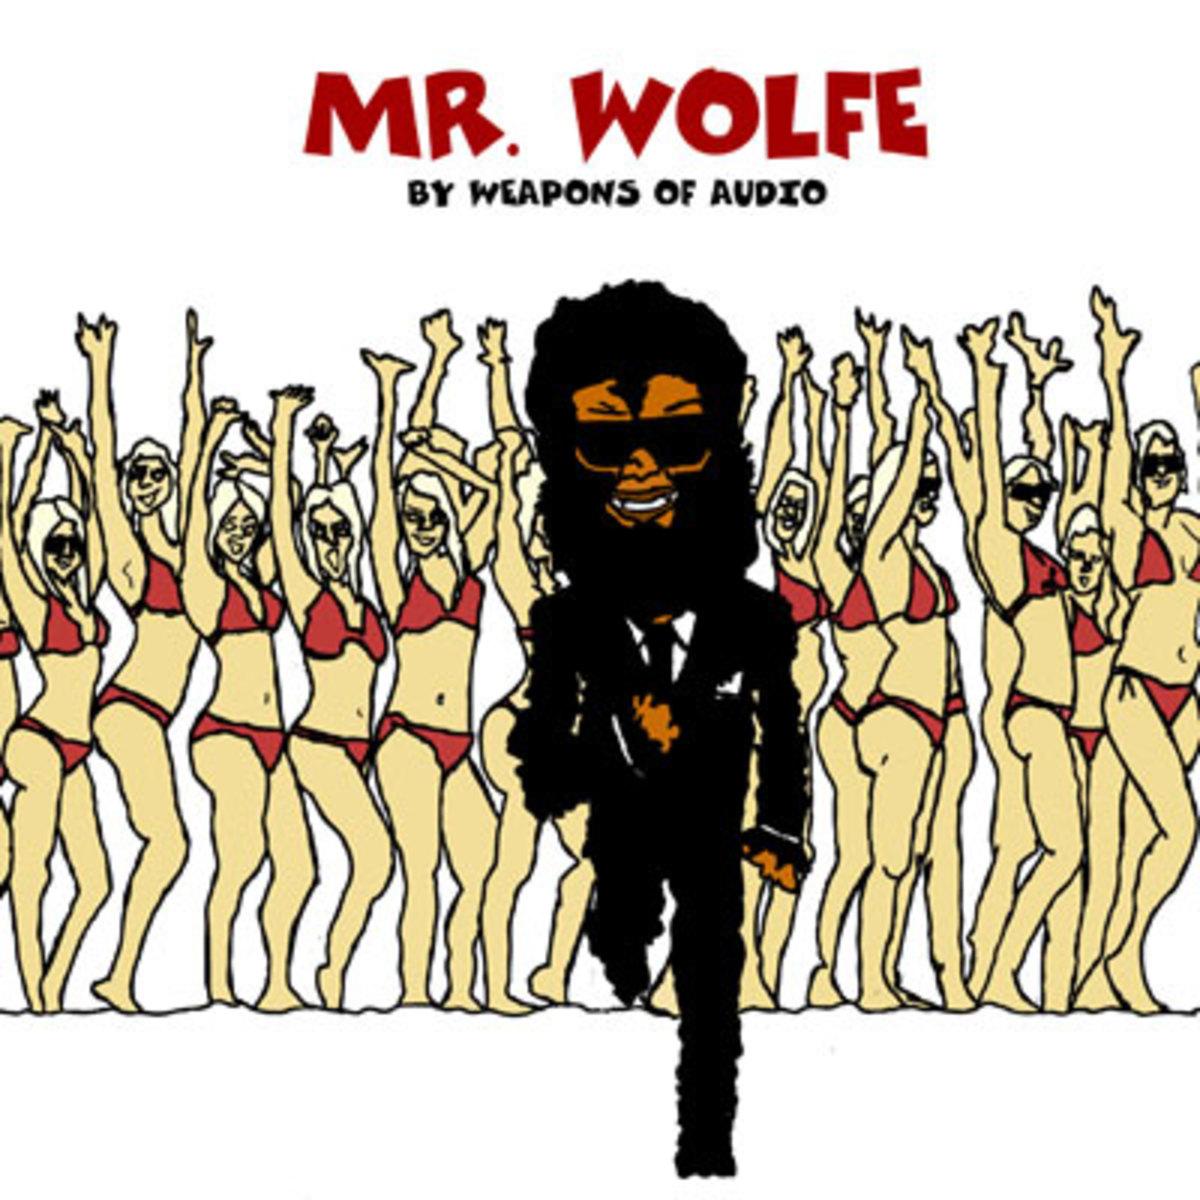 woa-mrwolfe.jpg